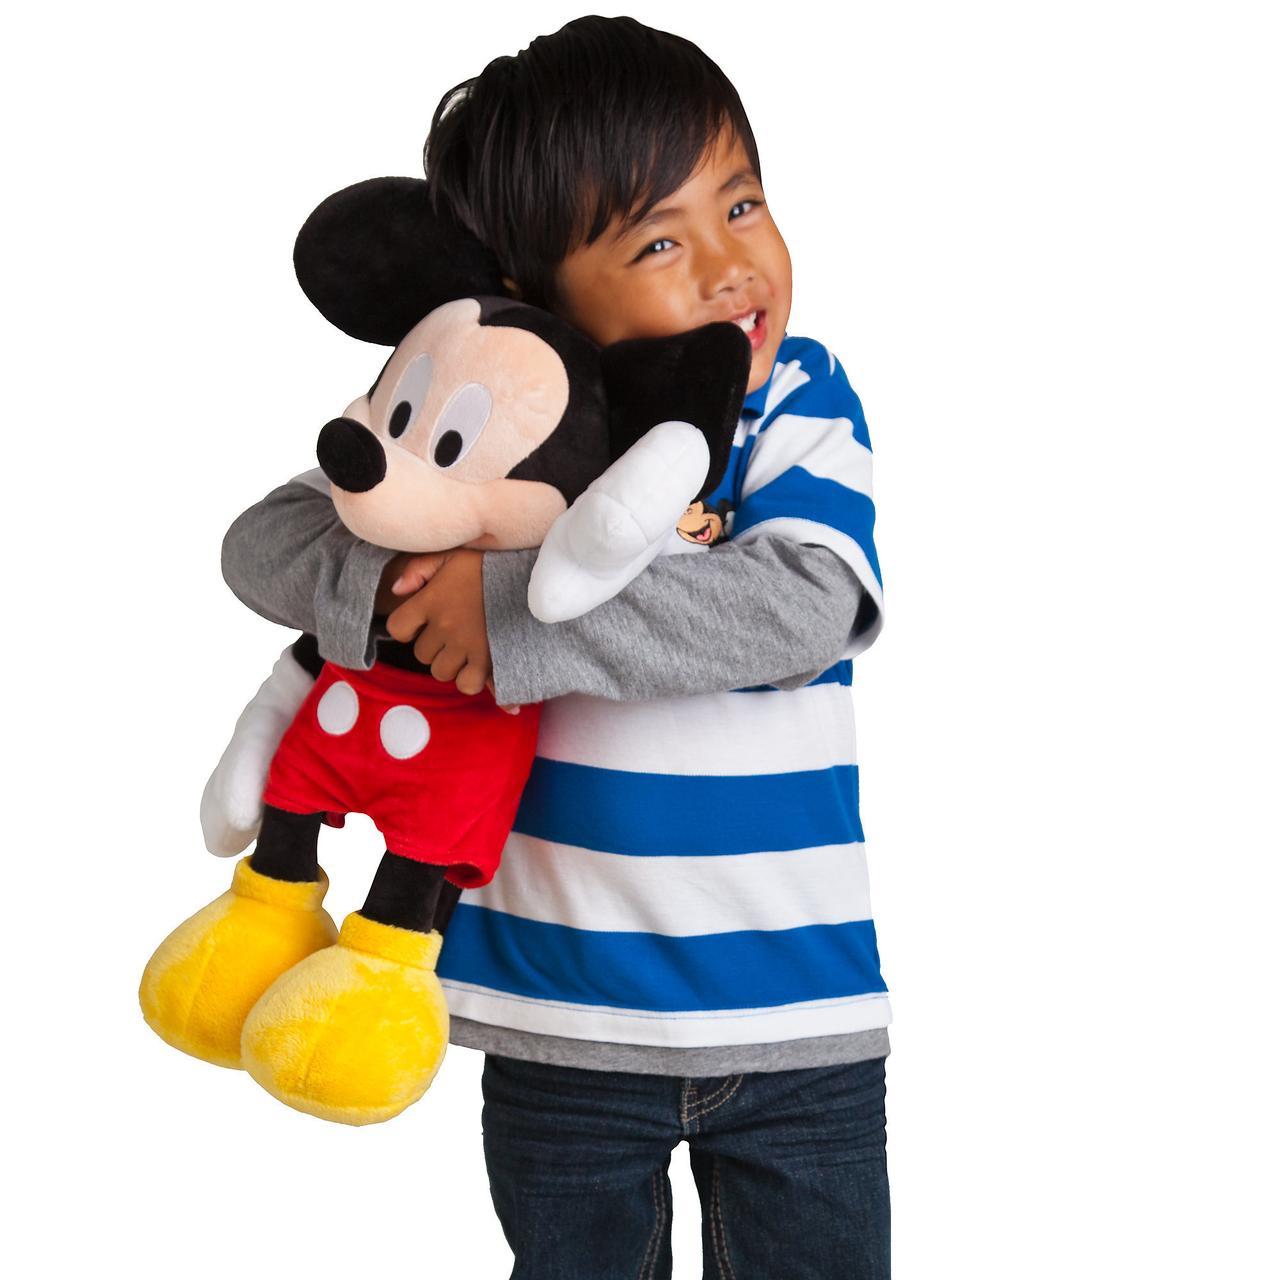 Мягкая игрушка Микки Маус Дисней, Mickey Mouse Disney 48 см. Оригинал